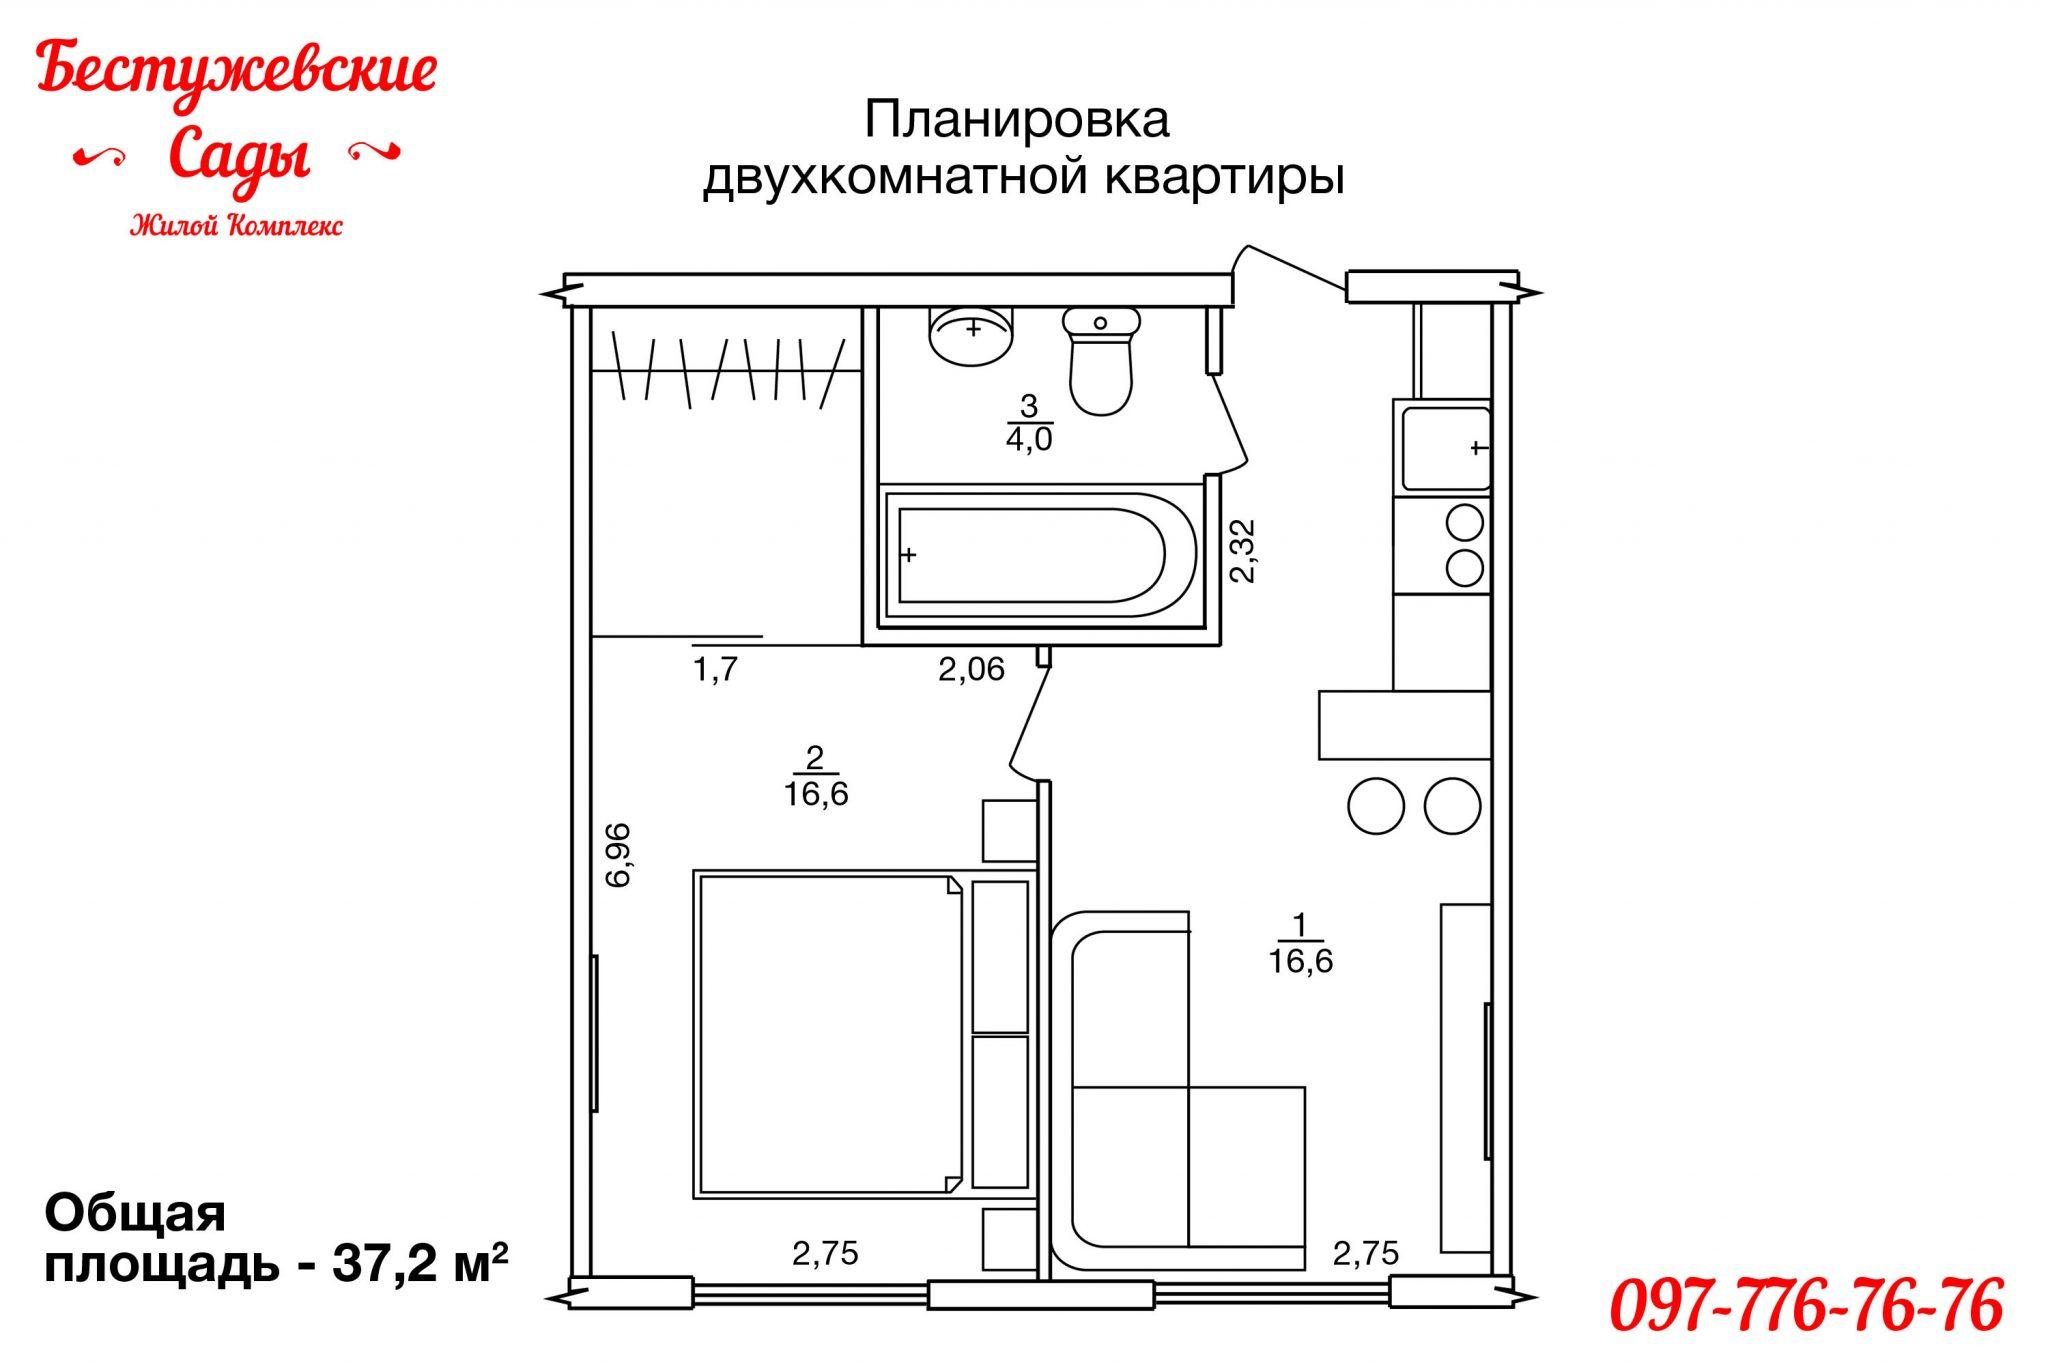 Квартиры под ключ в ЖК Бестужевские сады